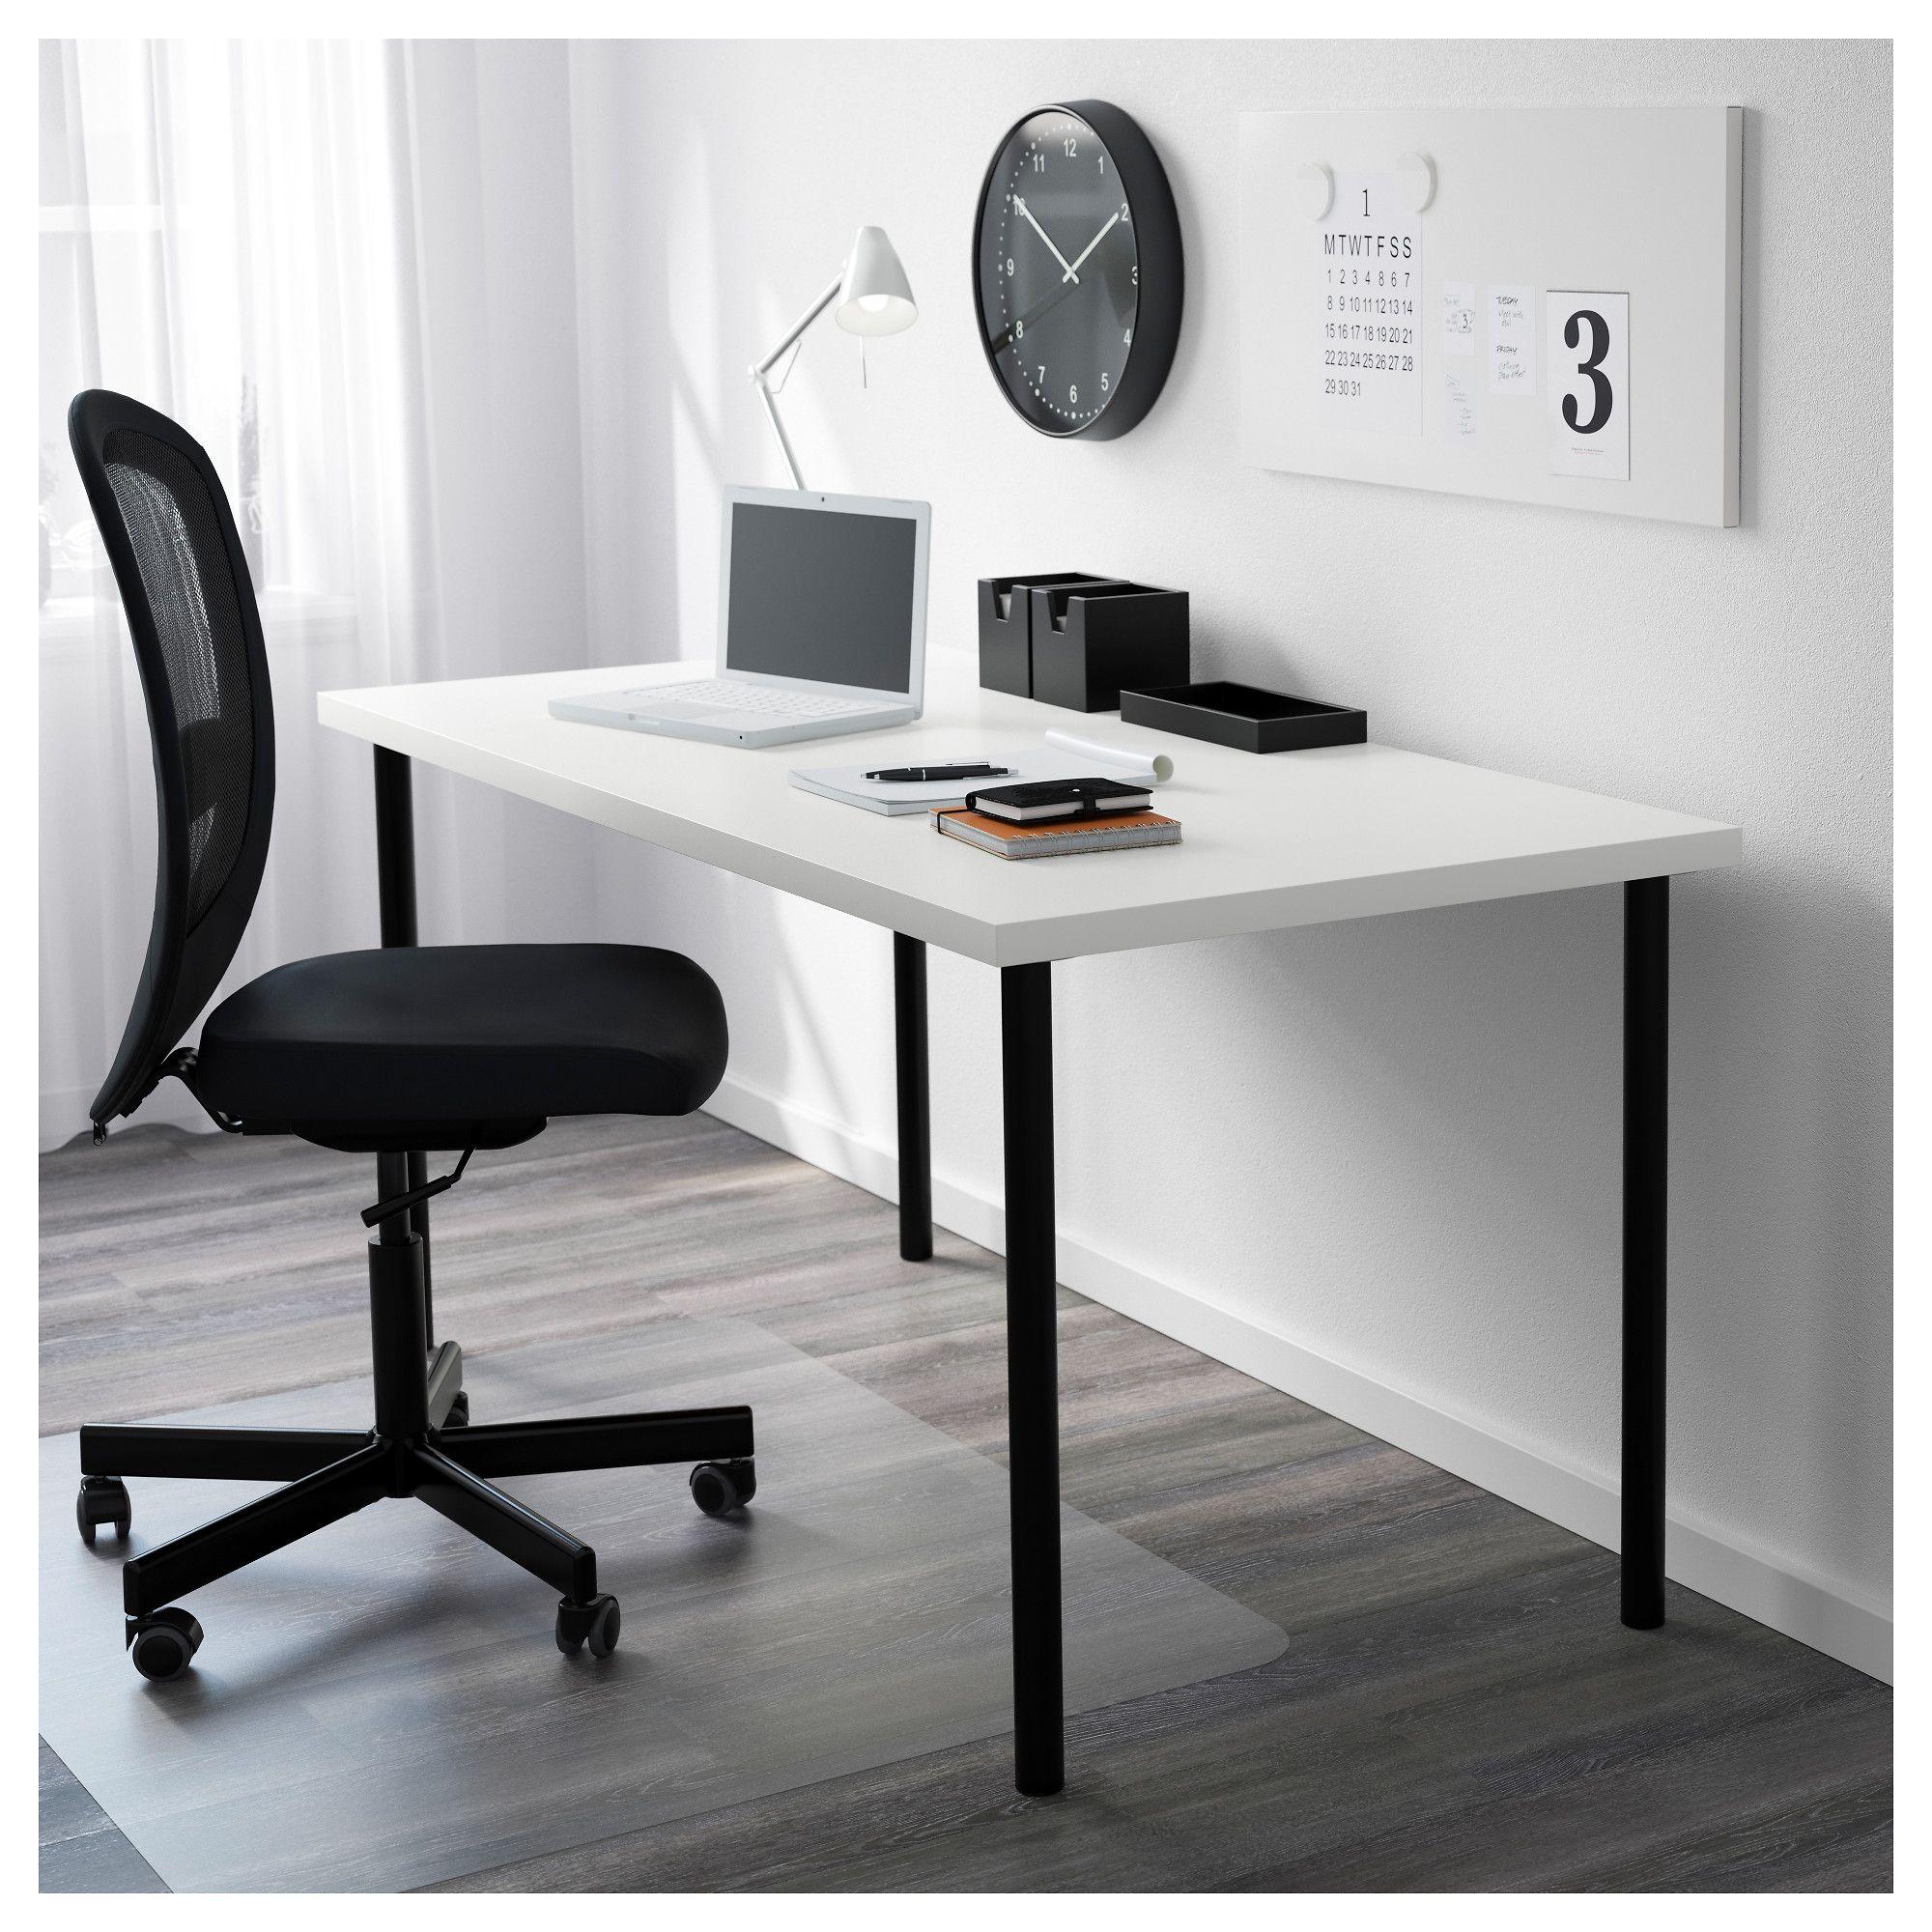 Linnmon Adils Table White Black Ikea Canada Ikea Micke Desk Ikea Micke Desk Ikea